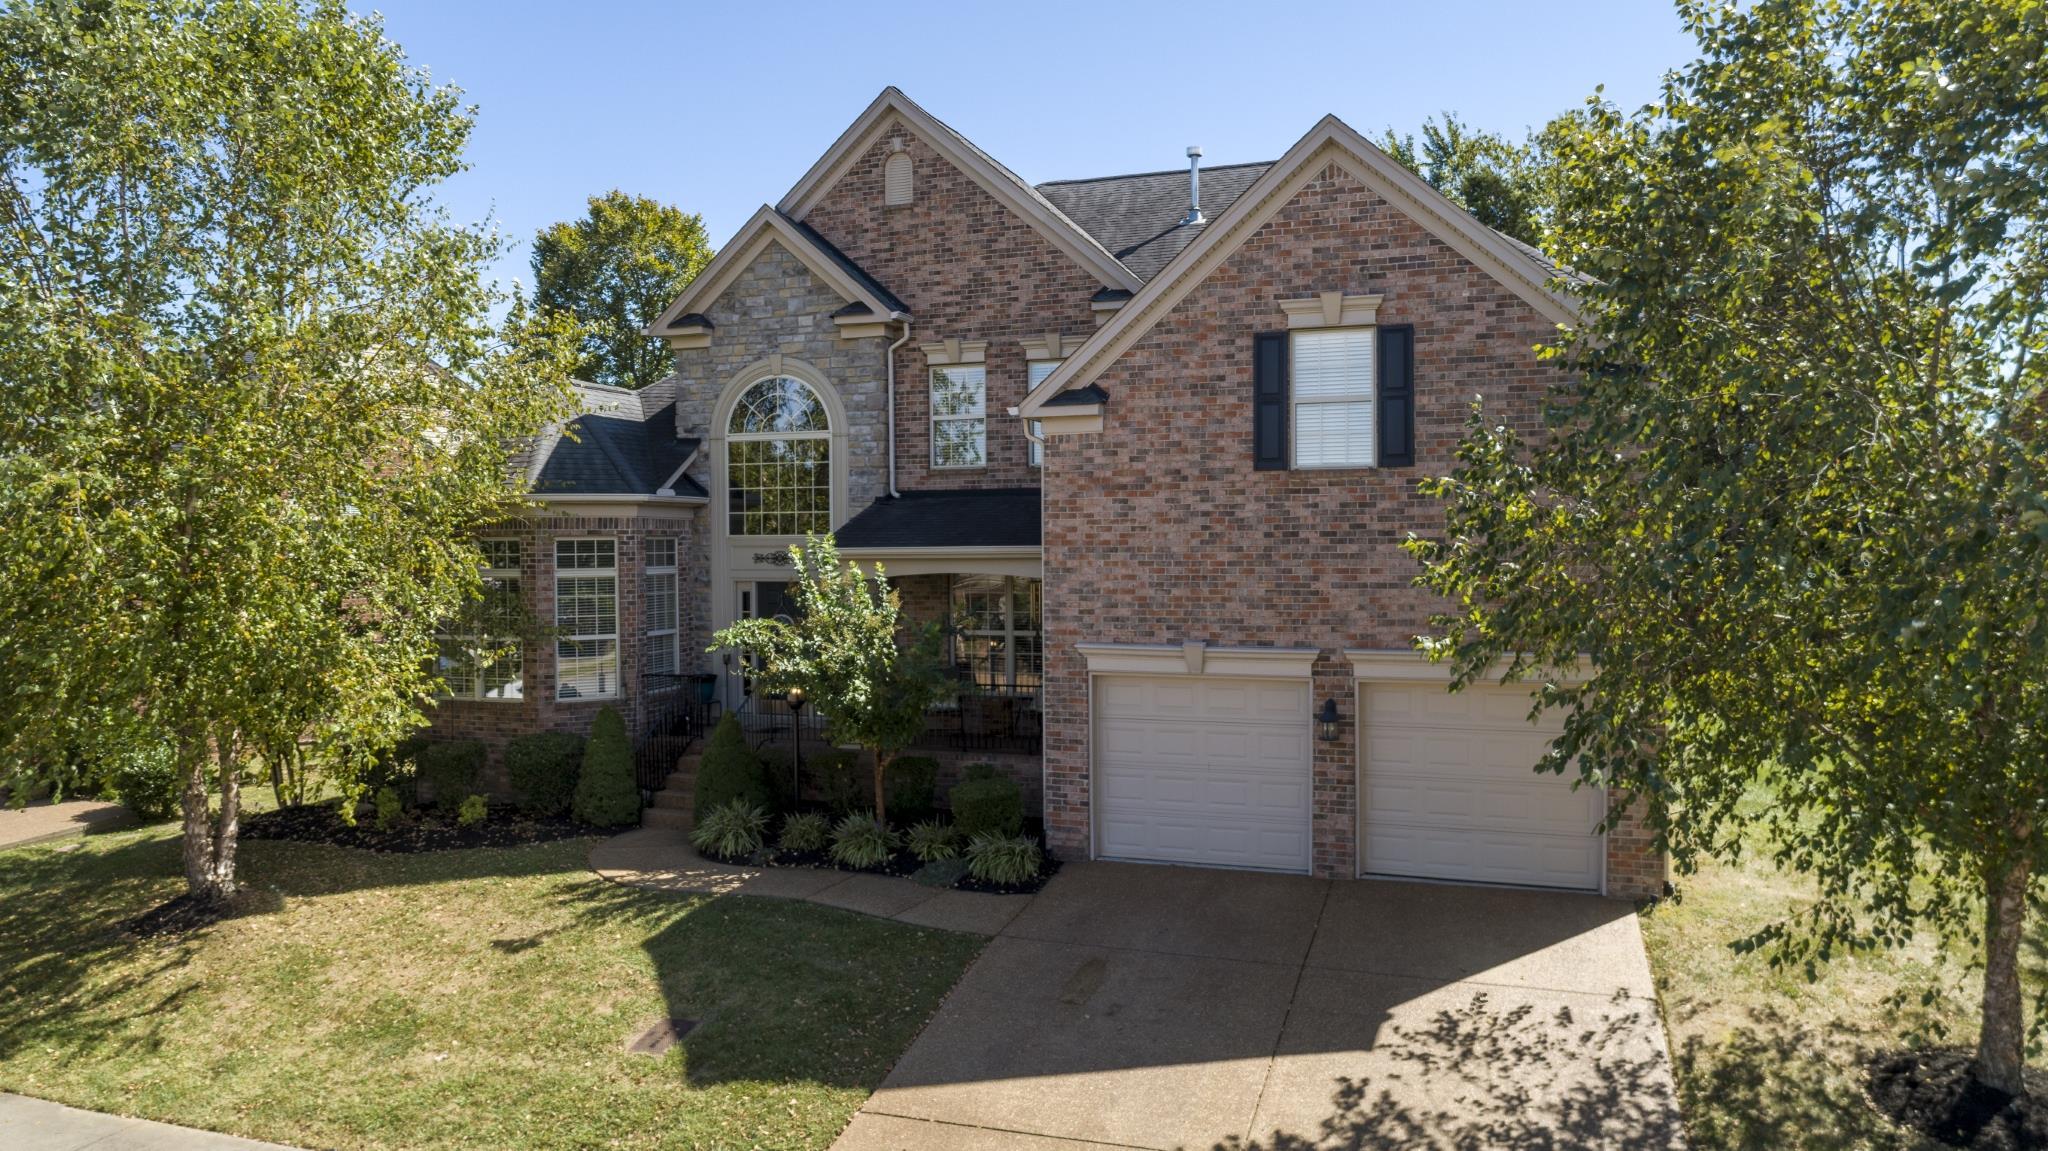 1245 Beech Hollow Dr, Nashville, TN 37211 - Nashville, TN real estate listing